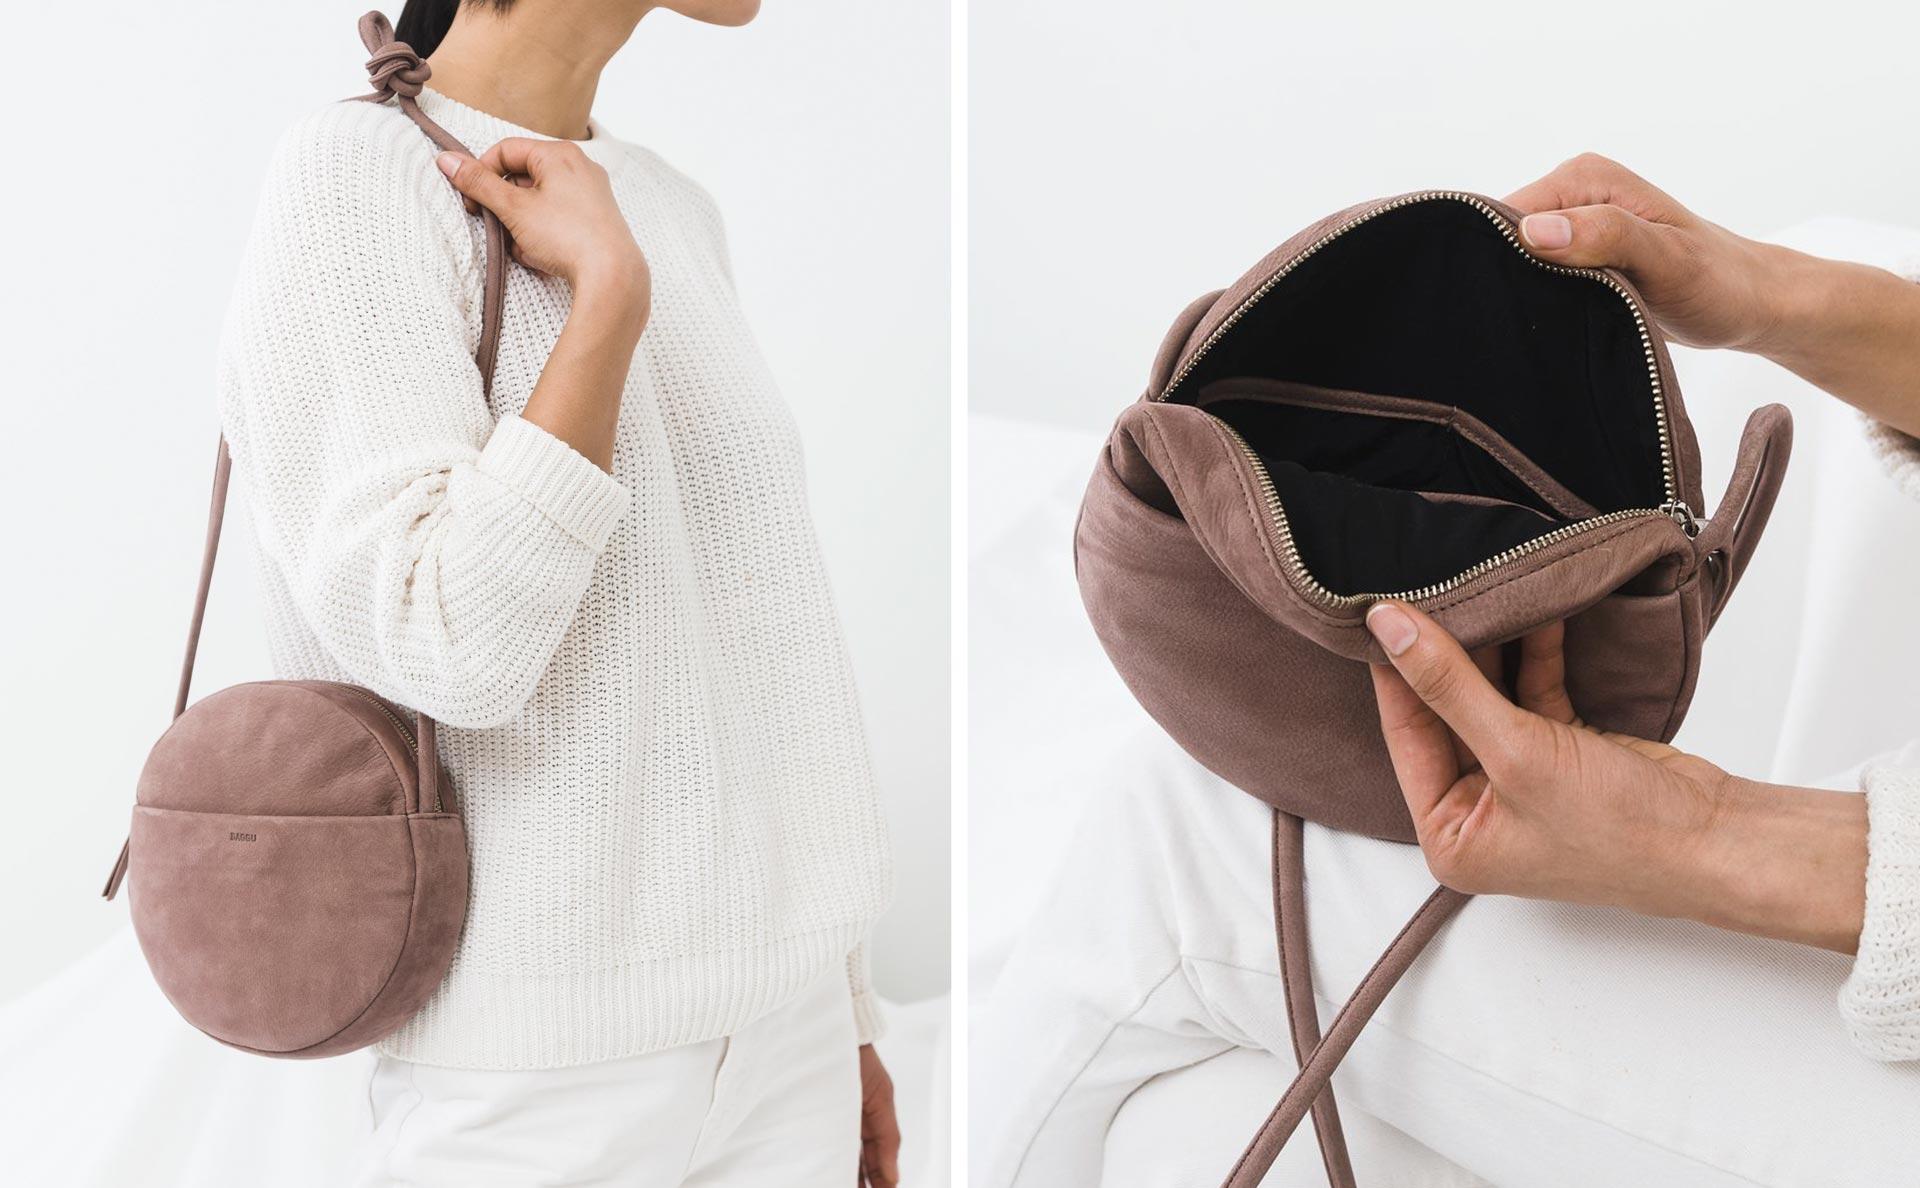 circle-purse-2-leather-taro-nubuck-02-2048x2048.jpg